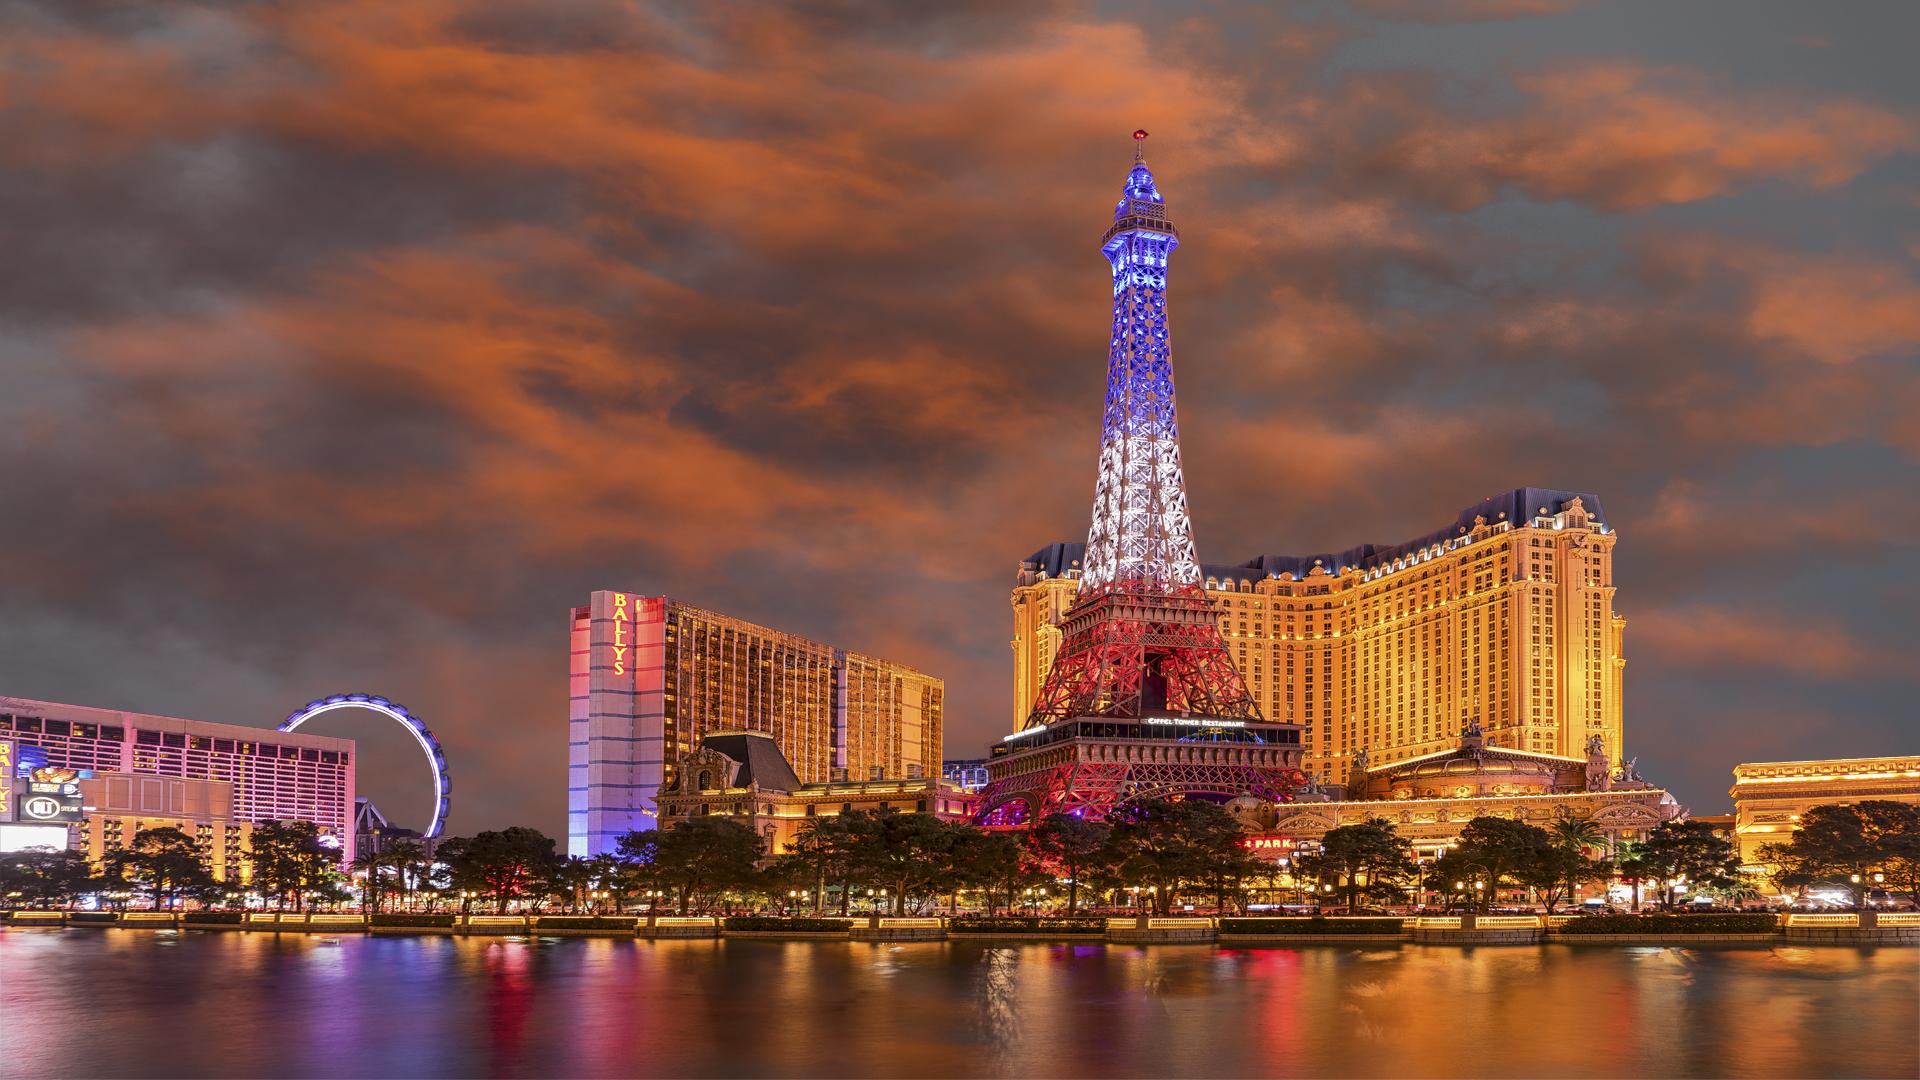 LV Paris Sunset 3